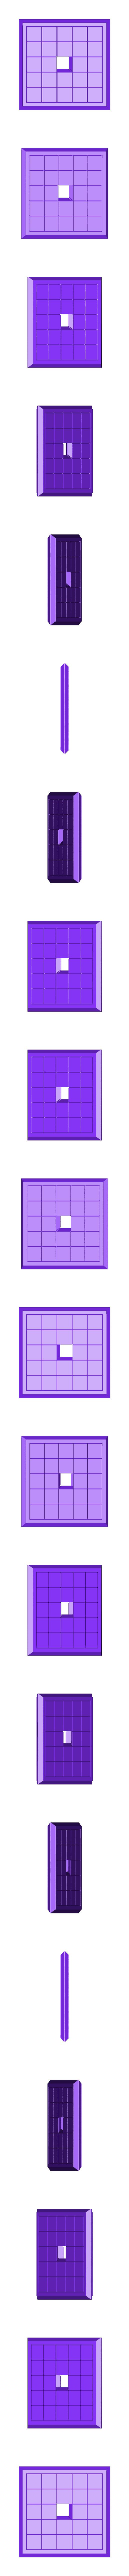 Sliding5x5BlankPuzzle5.stl Download STL file Two Sided Sliding Puzzle • 3D printable model, Jinja